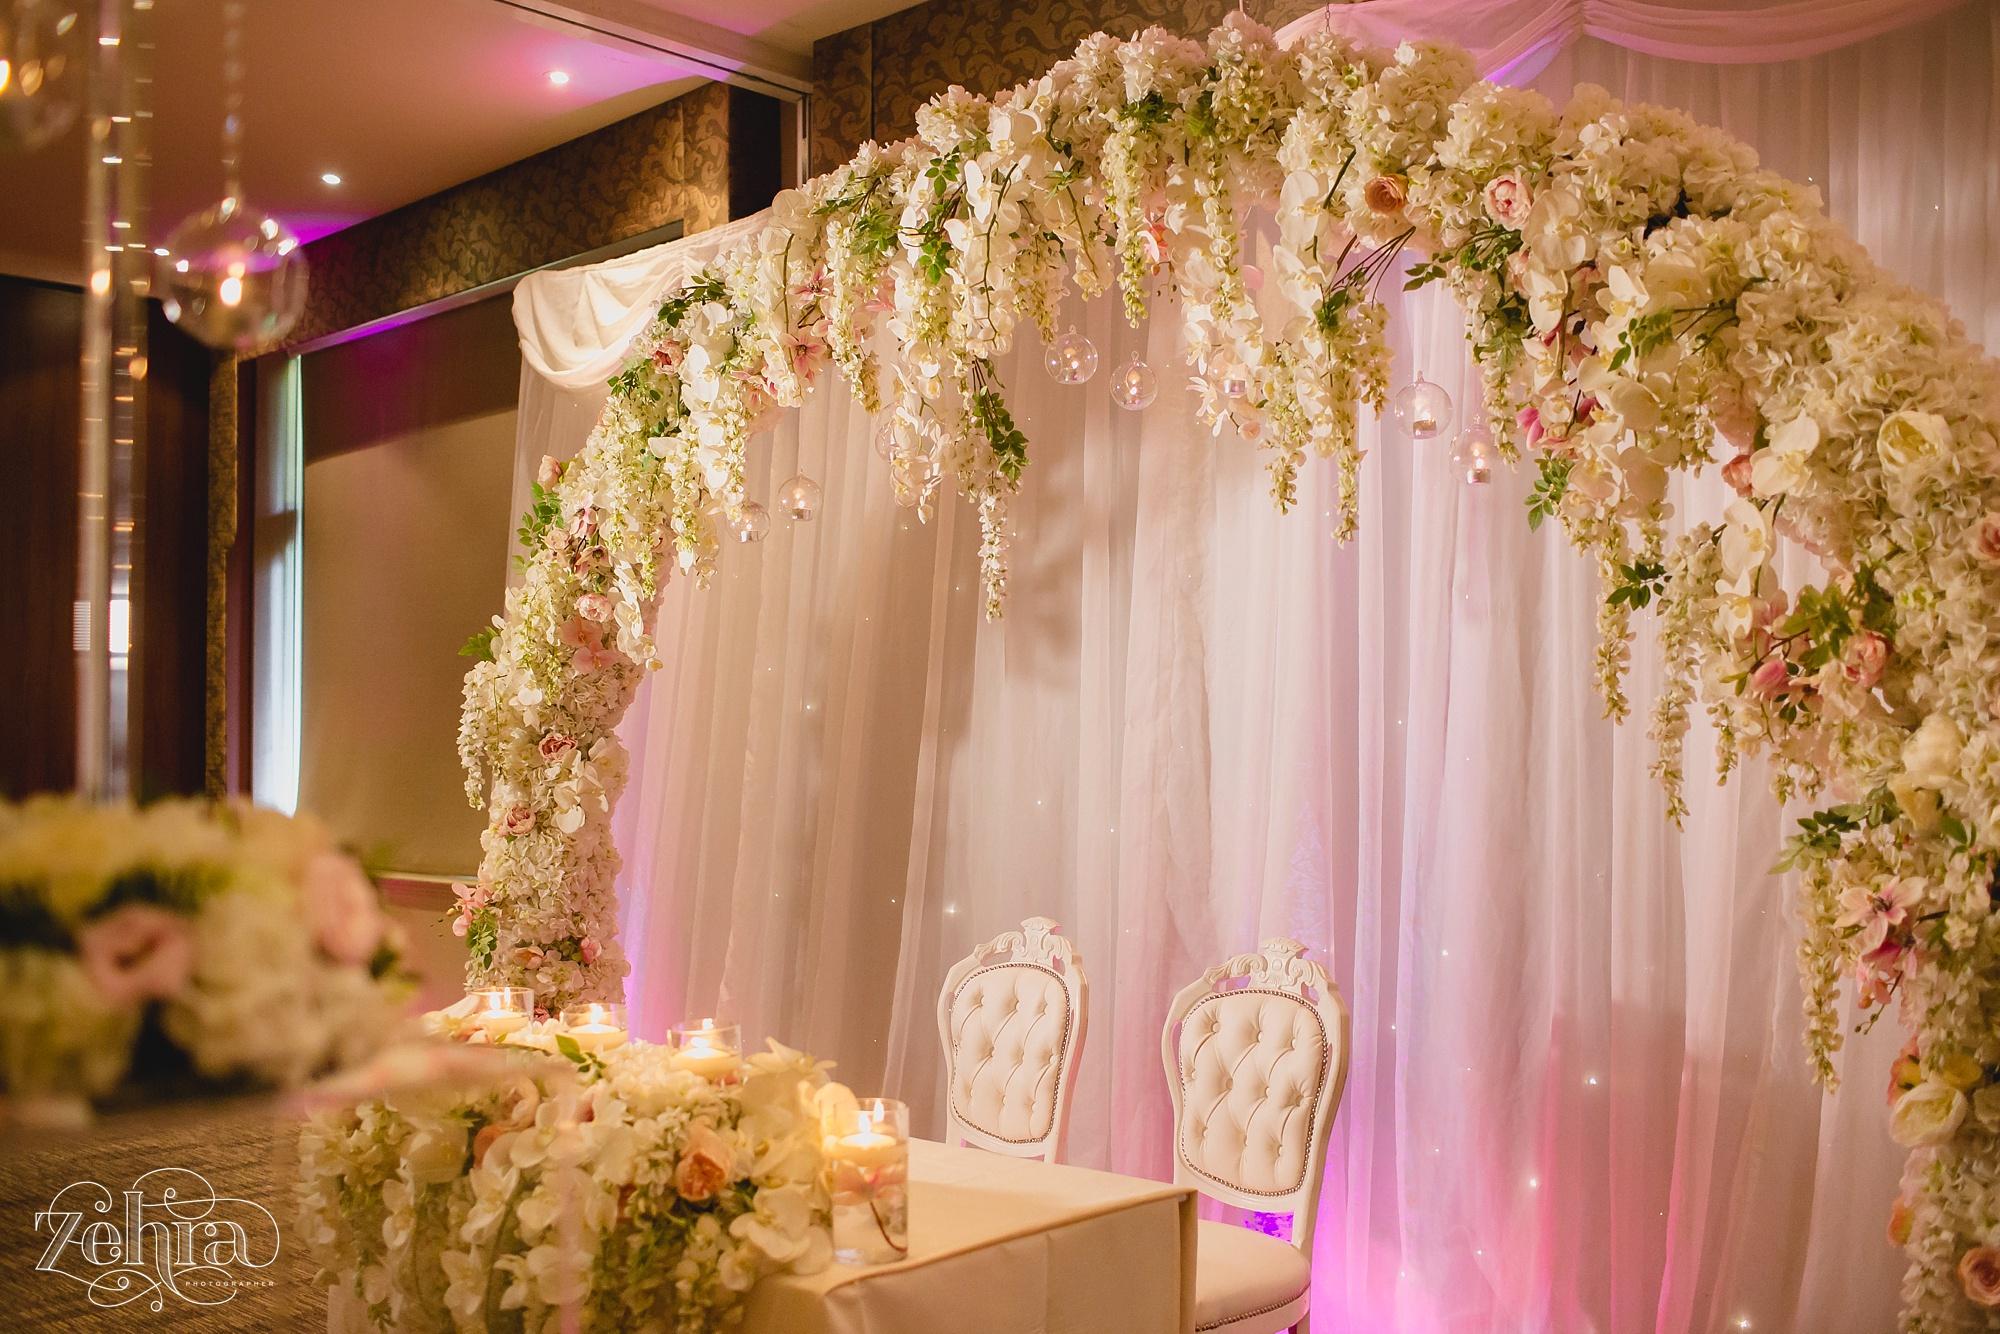 zehra photographer mere cheshire wedding_0006.jpg